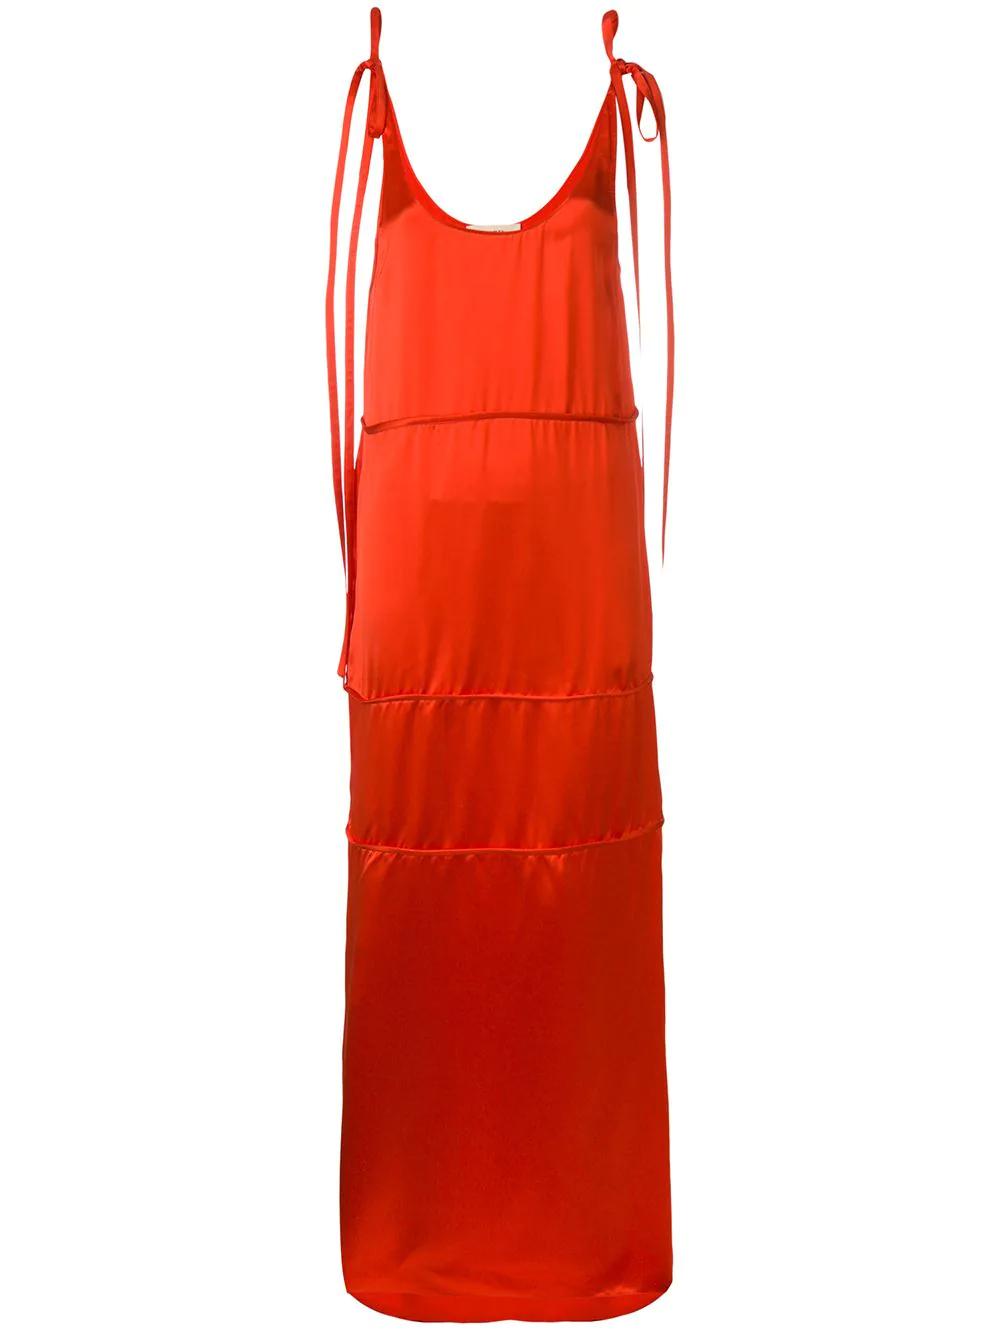 Ports 1961   длинное платье-рубашка с лямками на завязках   Clouty